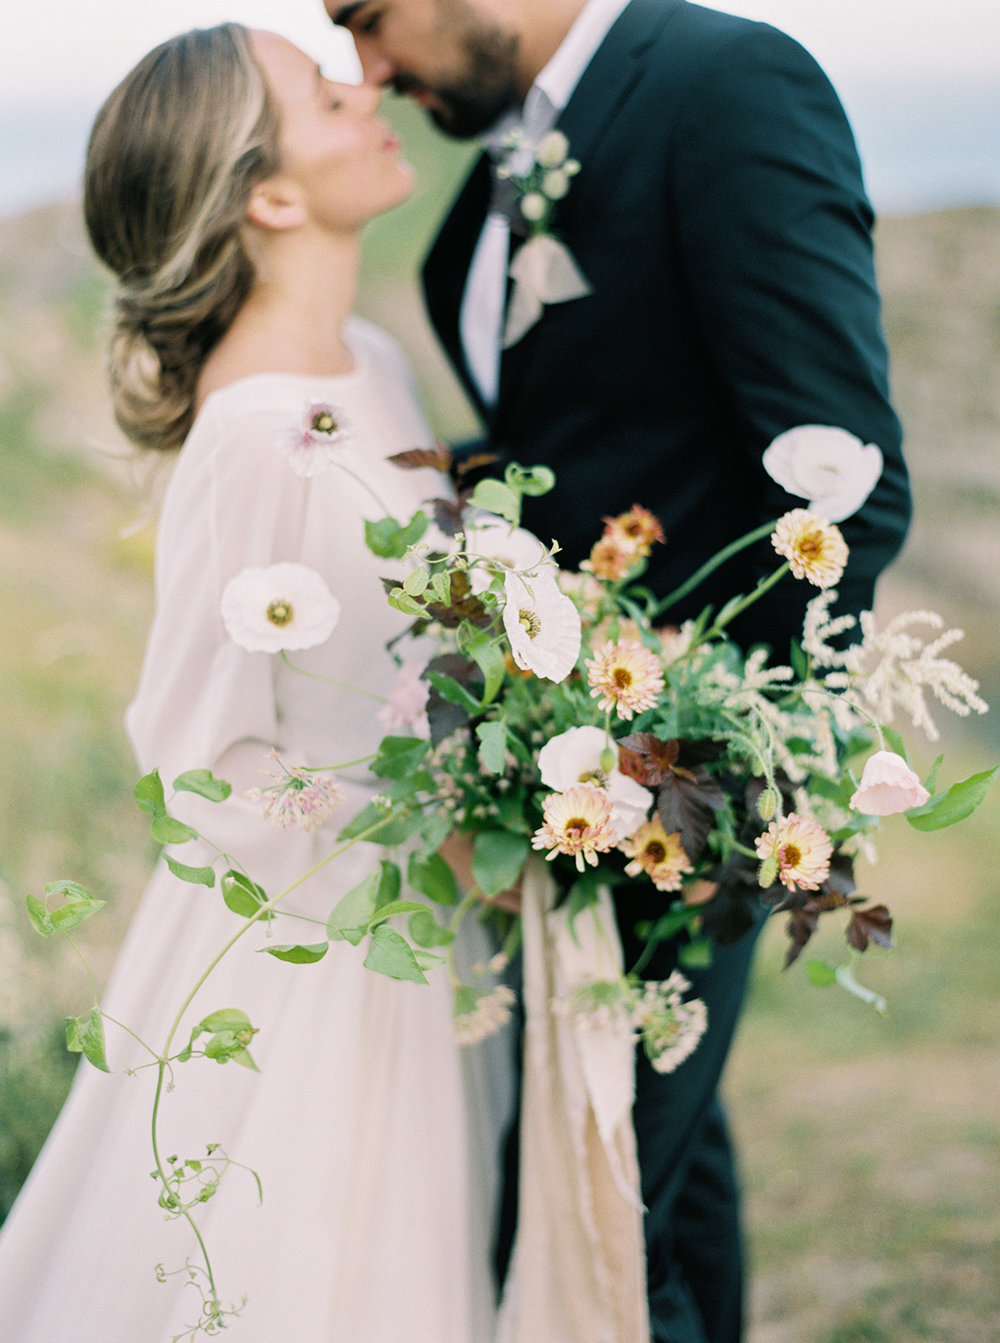 JulieCate_England_wedding Romantic.jpg